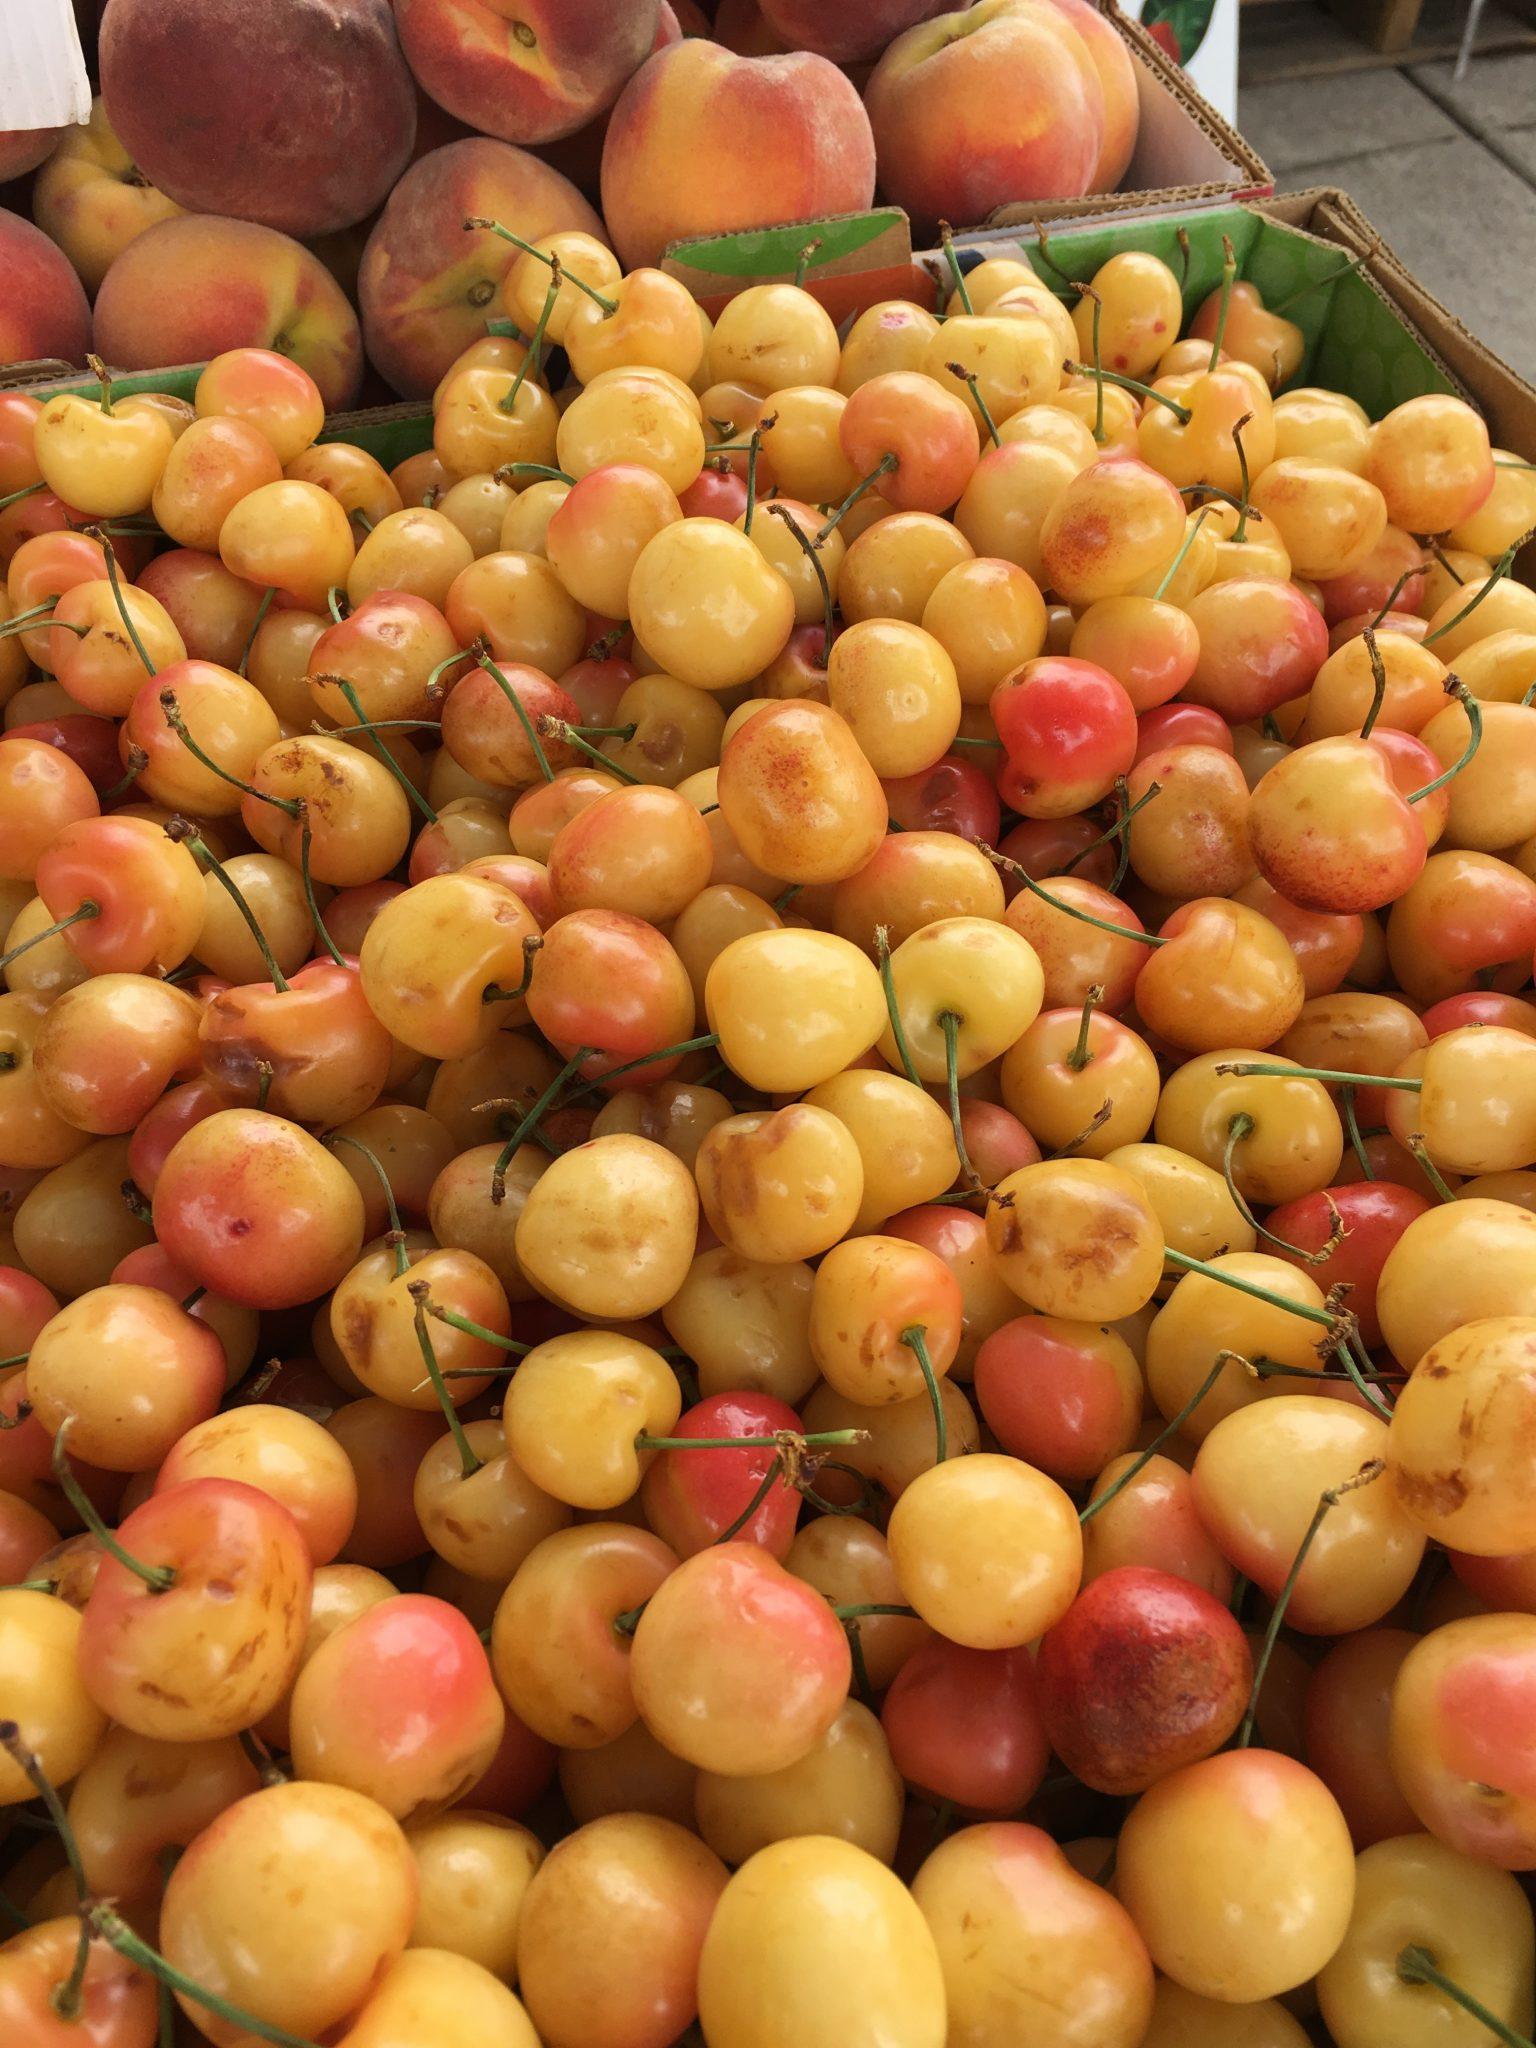 Produce Season- Coming Soon!